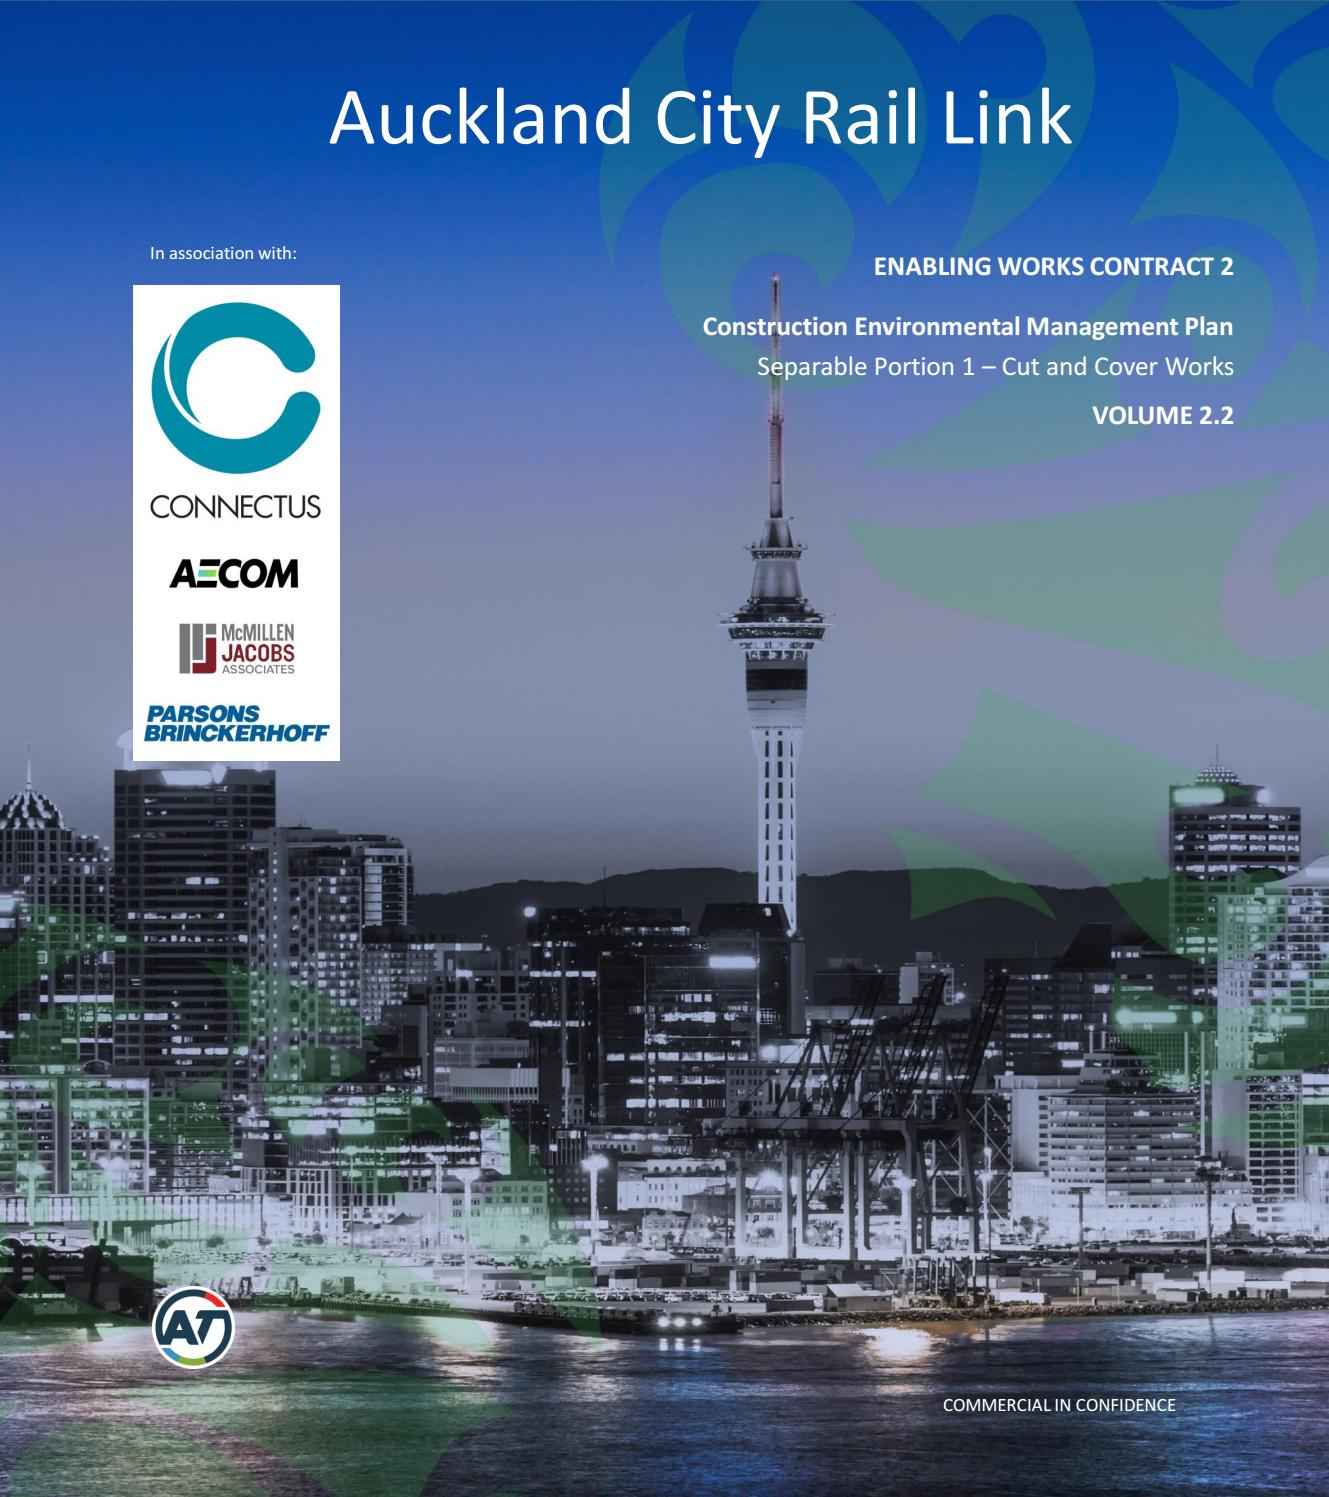 Contract 2 construciton environmental management plan vol 2